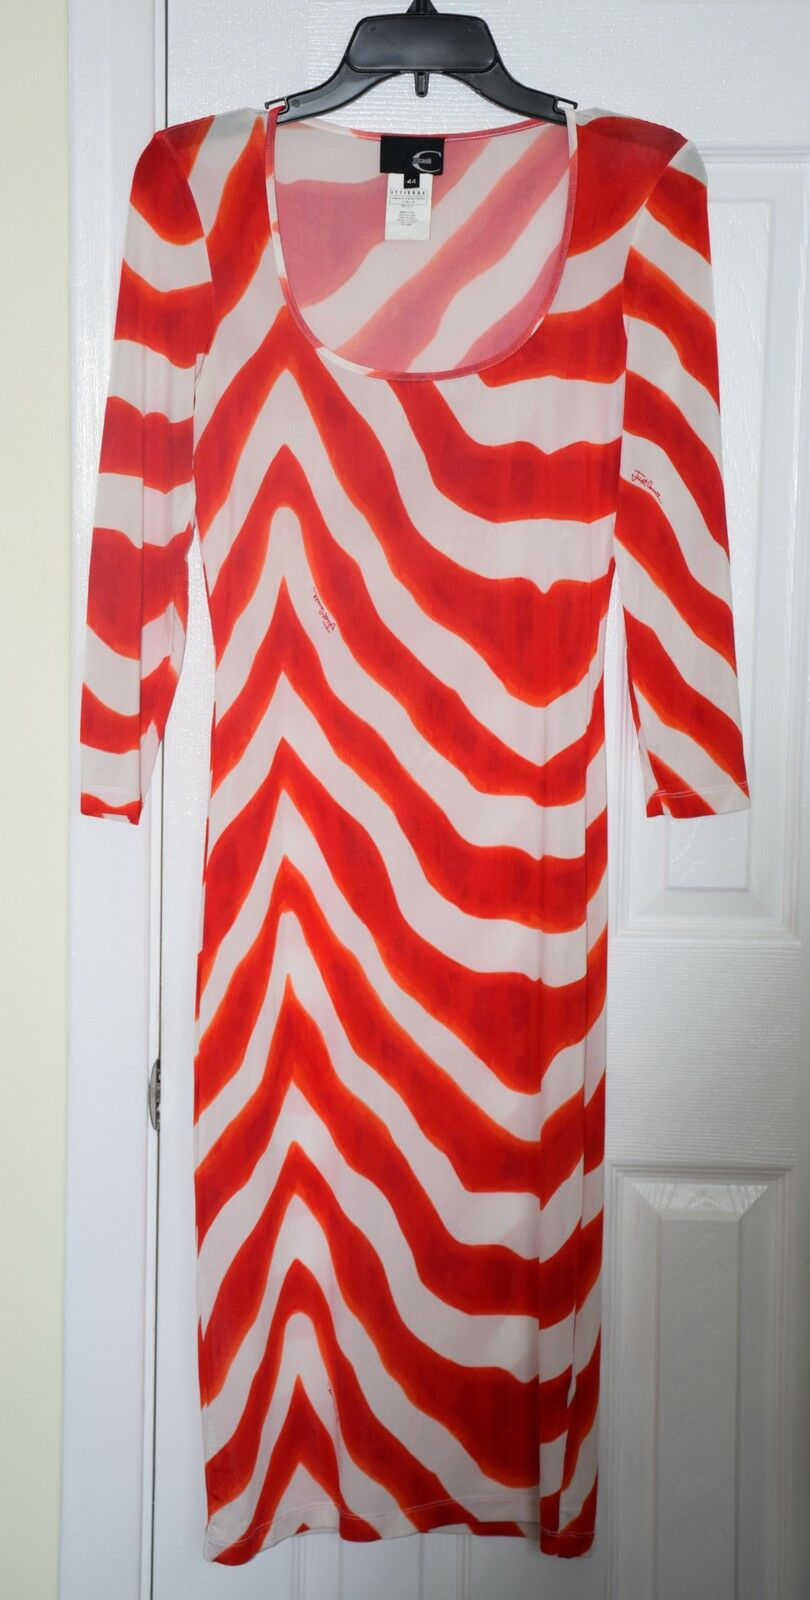 JUST Cavalli red zebra print Roberto signature stretch midi dress 44 US 8